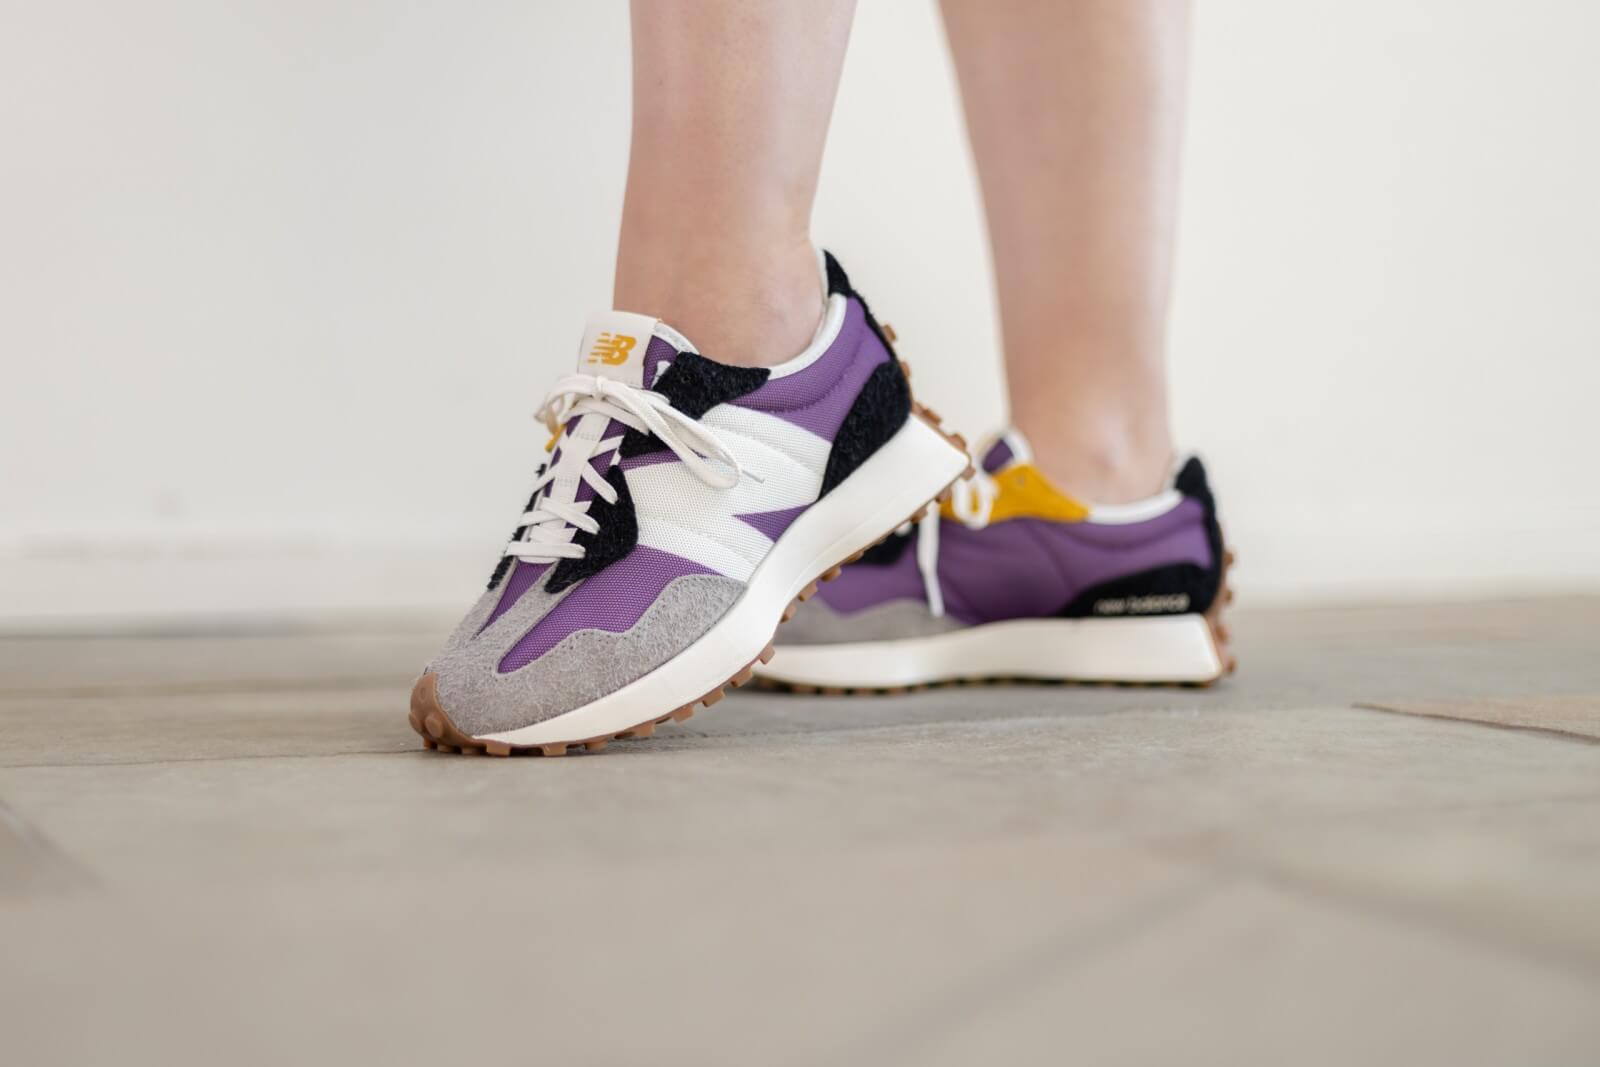 new balance 1300 femme violet cheap online